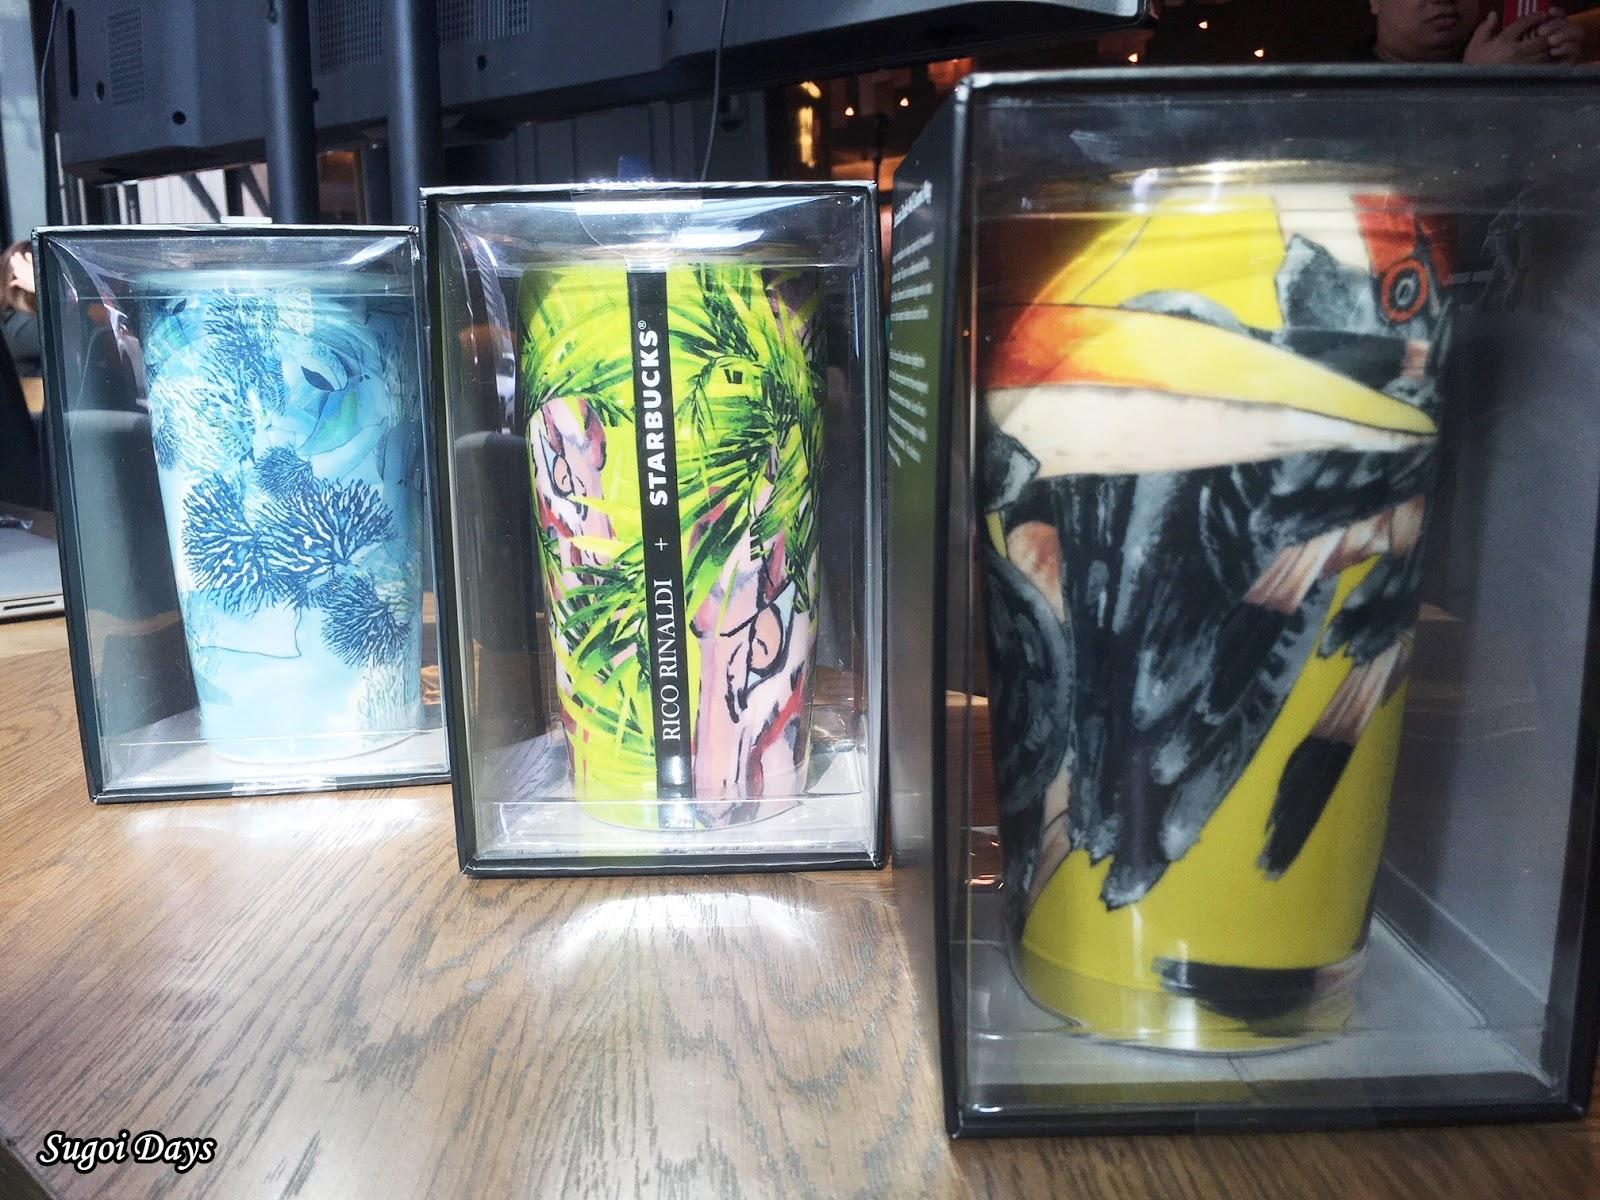 Starbucks Designer Rico X Collection Sugoi Rinaldi Days2018 fvbyIY76g